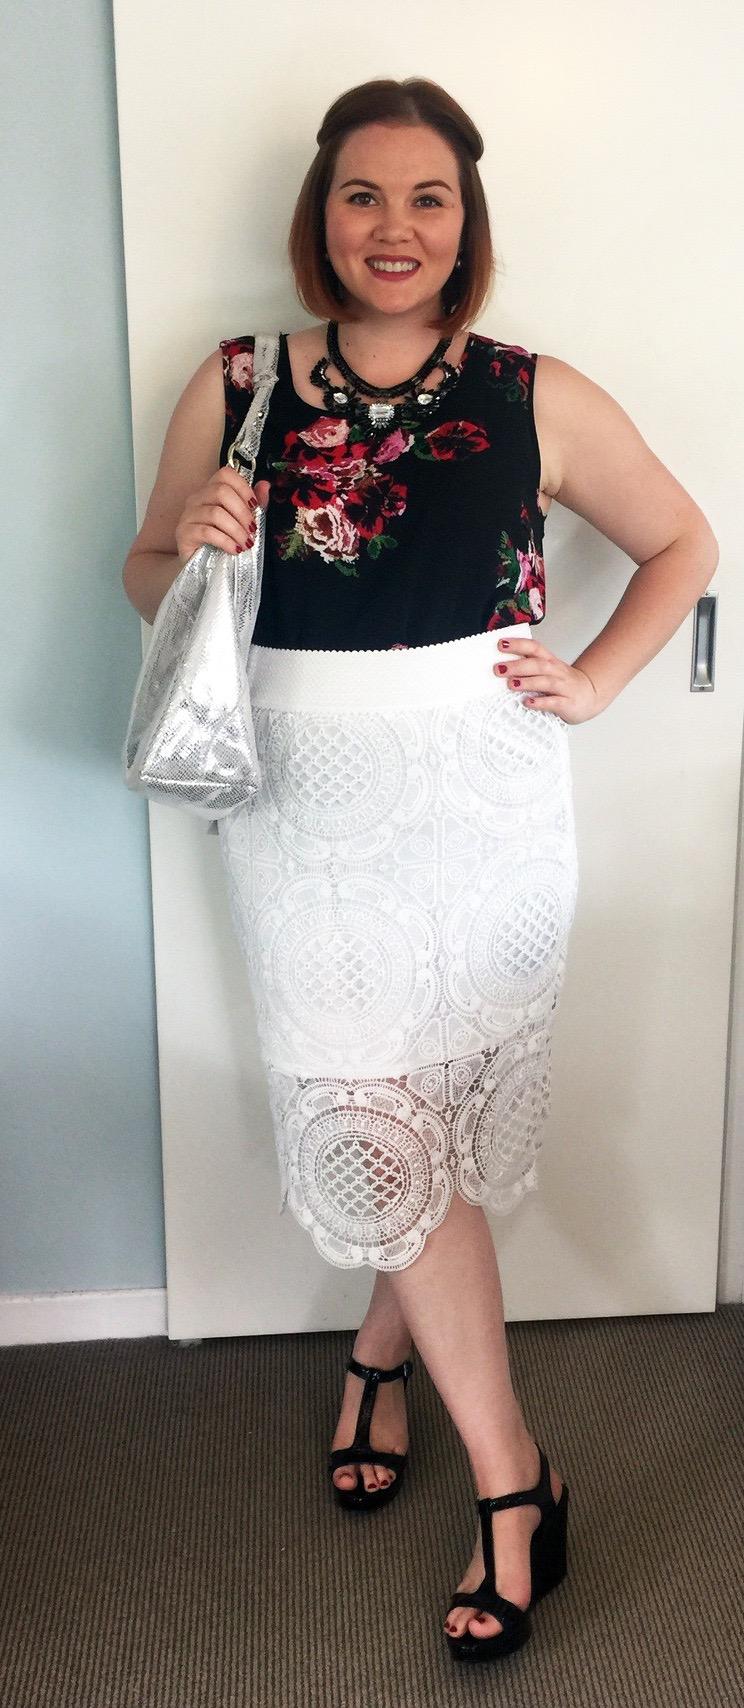 Urban Precinct tunic dress from Farmers, K-Mart skirt, Country Road shoes, Minx bag.